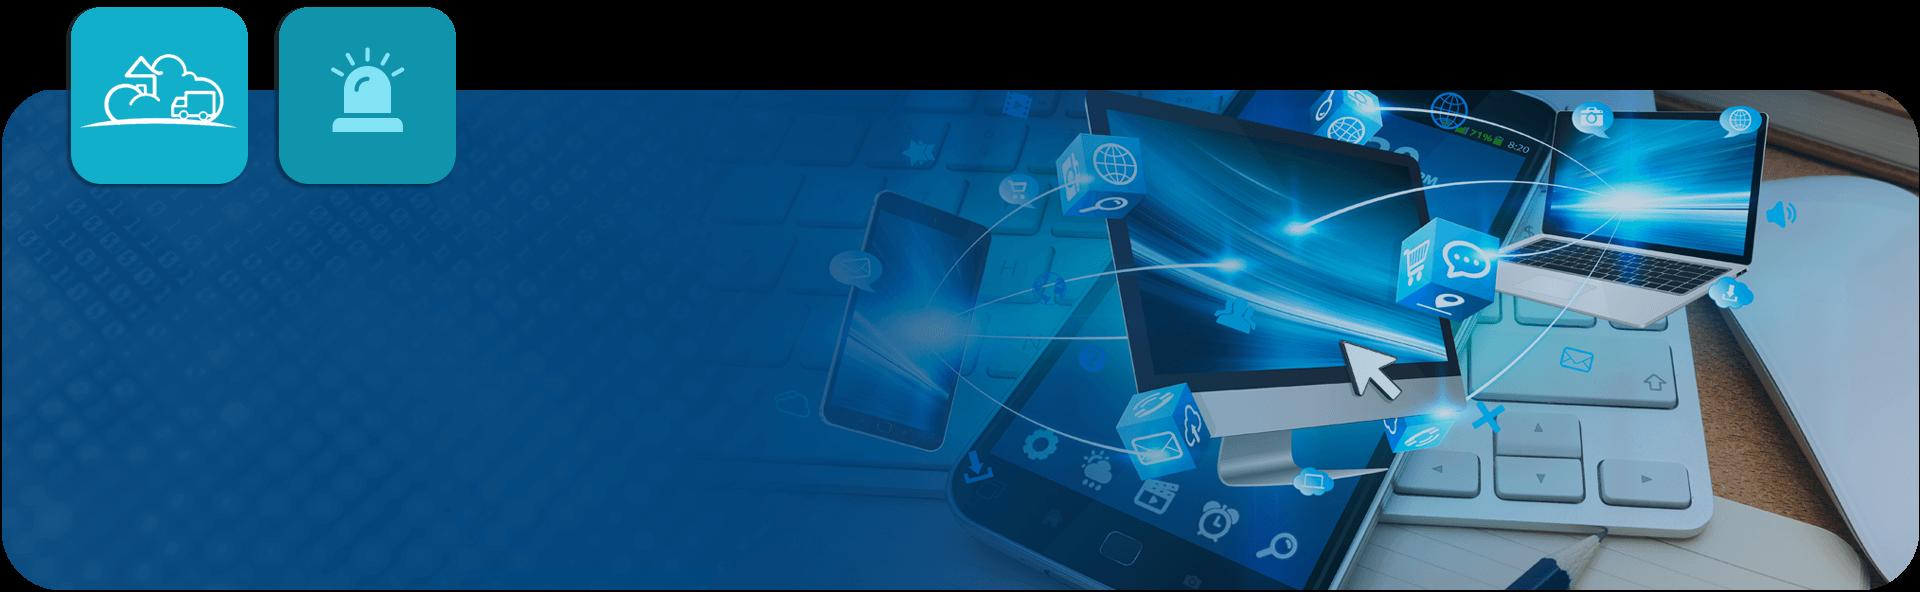 business mobile app illustration